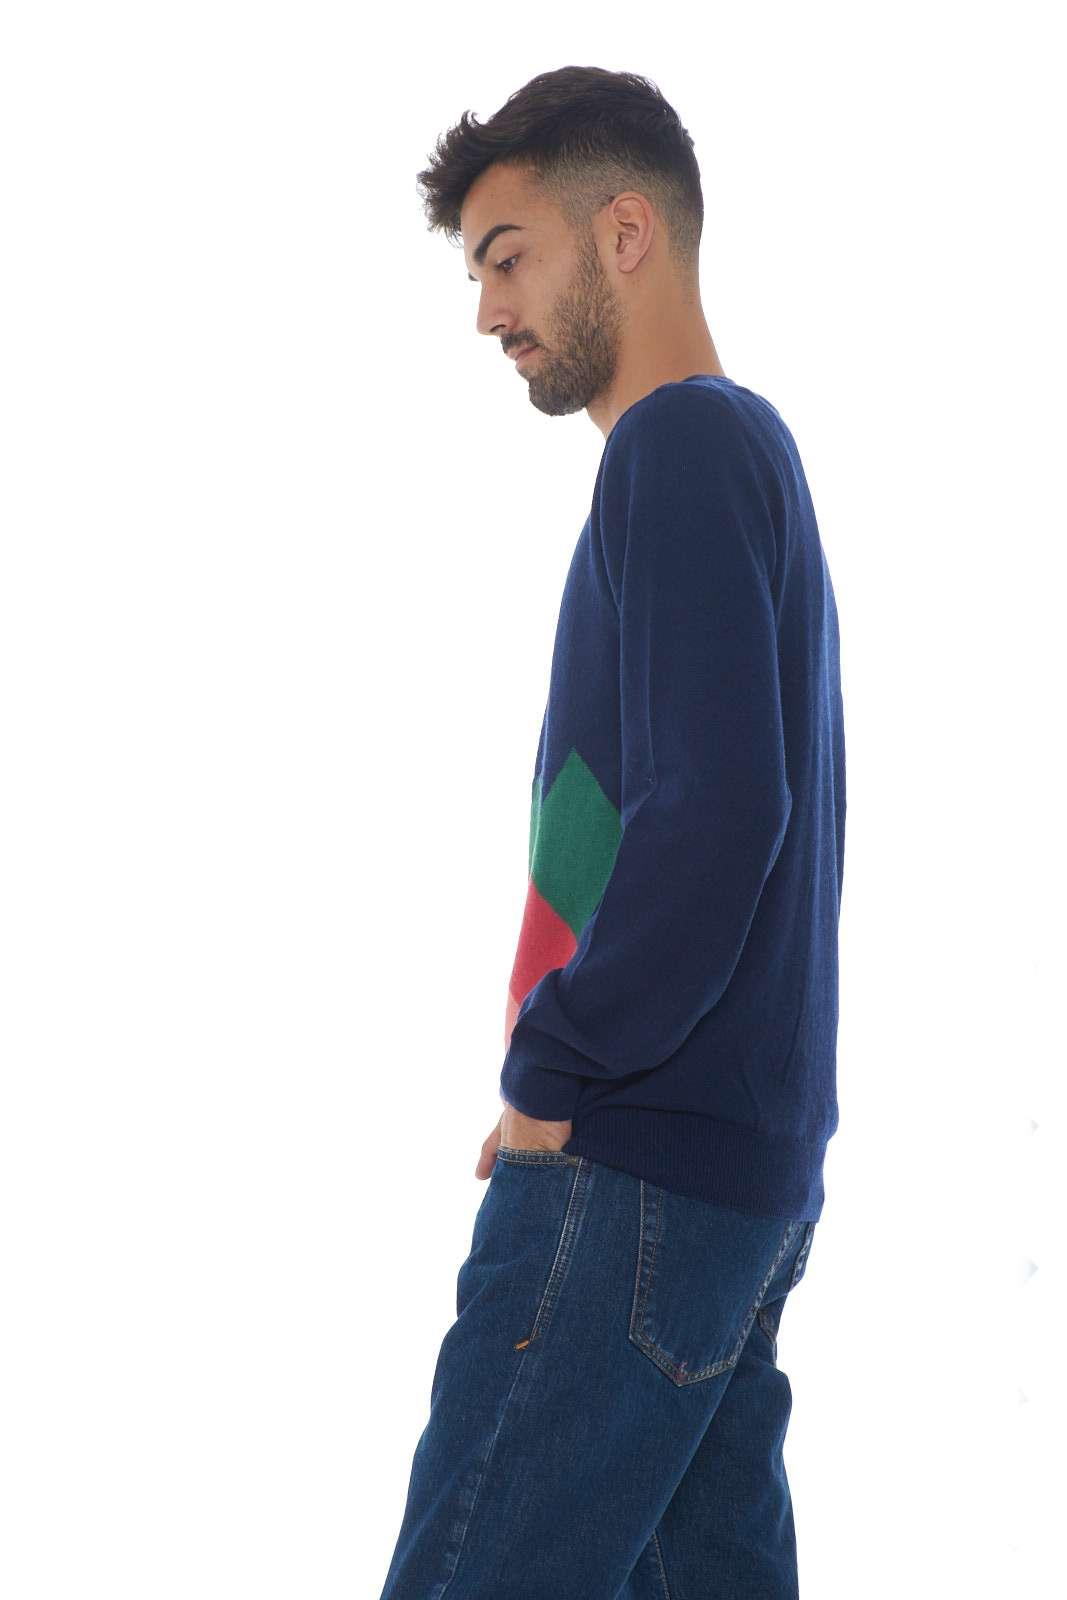 https://www.parmax.com/media/catalog/product/a/i/AI-outlet_parmax-maglia-uomo-Acquapura-006-B.jpg